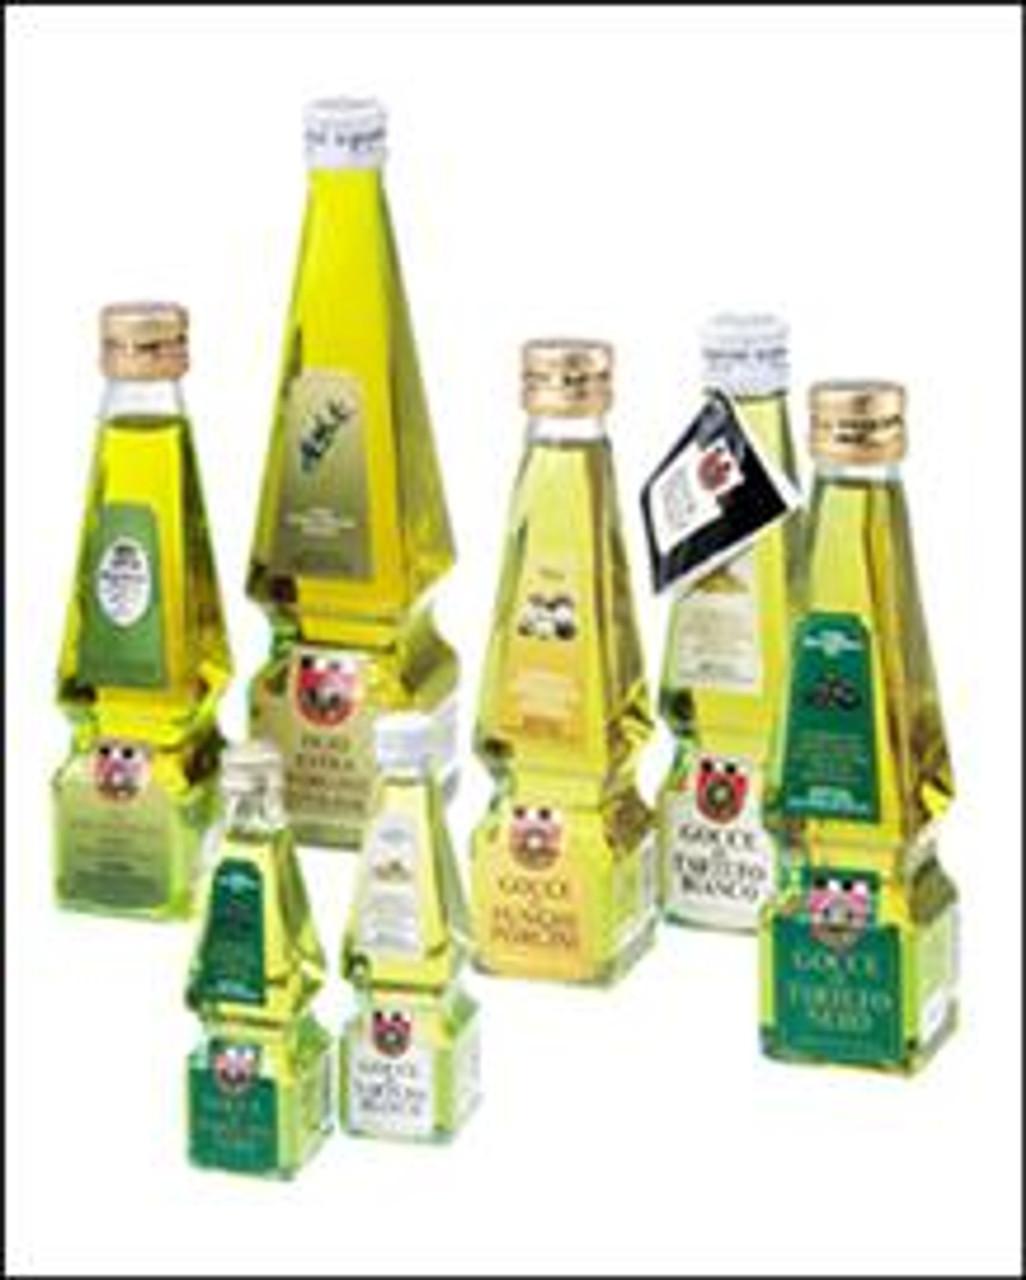 Urbani Extra Virgin Olive Oil with Black Truffle